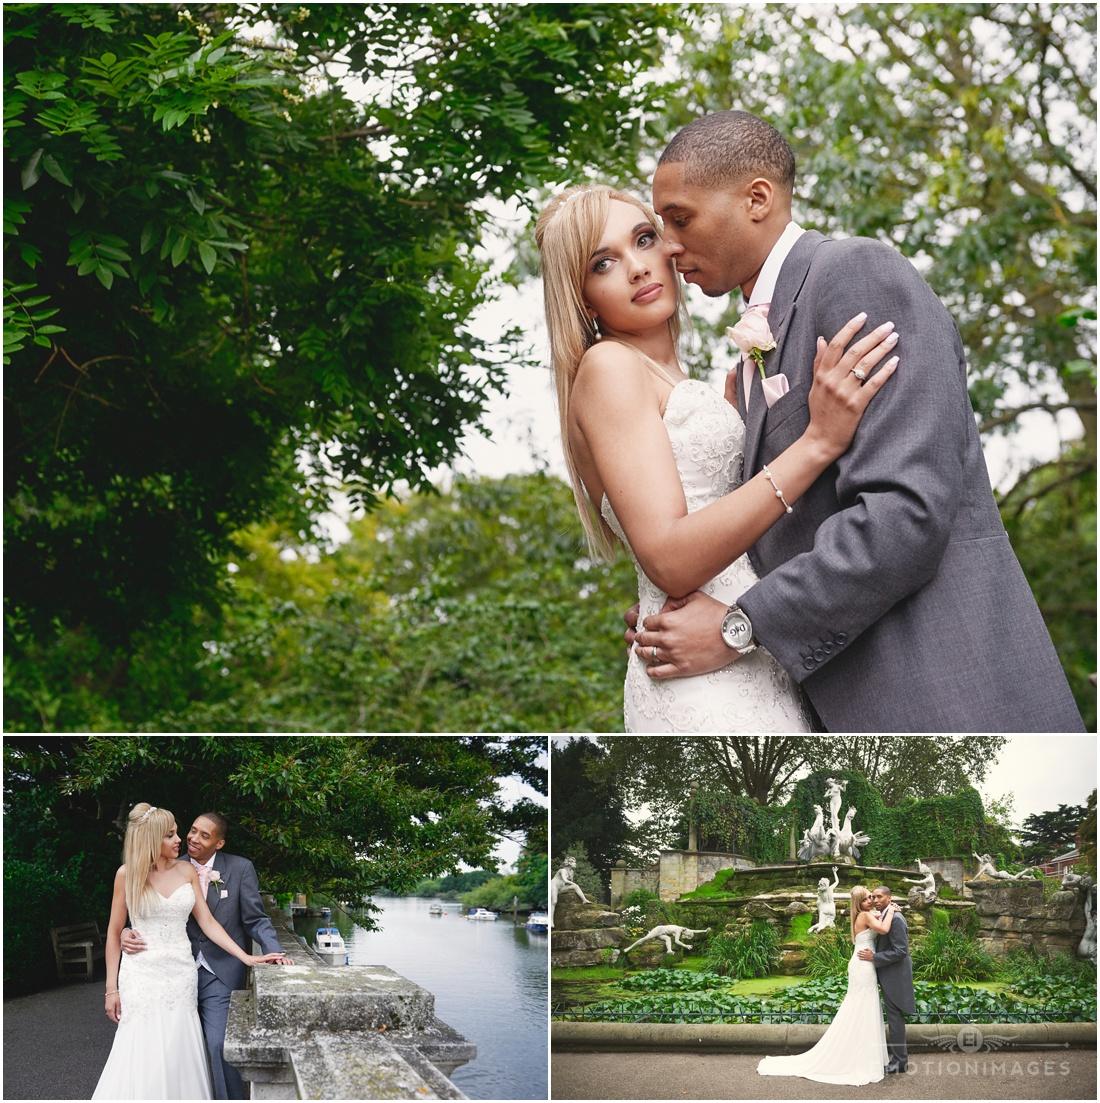 York_House_Twickenham_Wedding_Photography_013.JPG